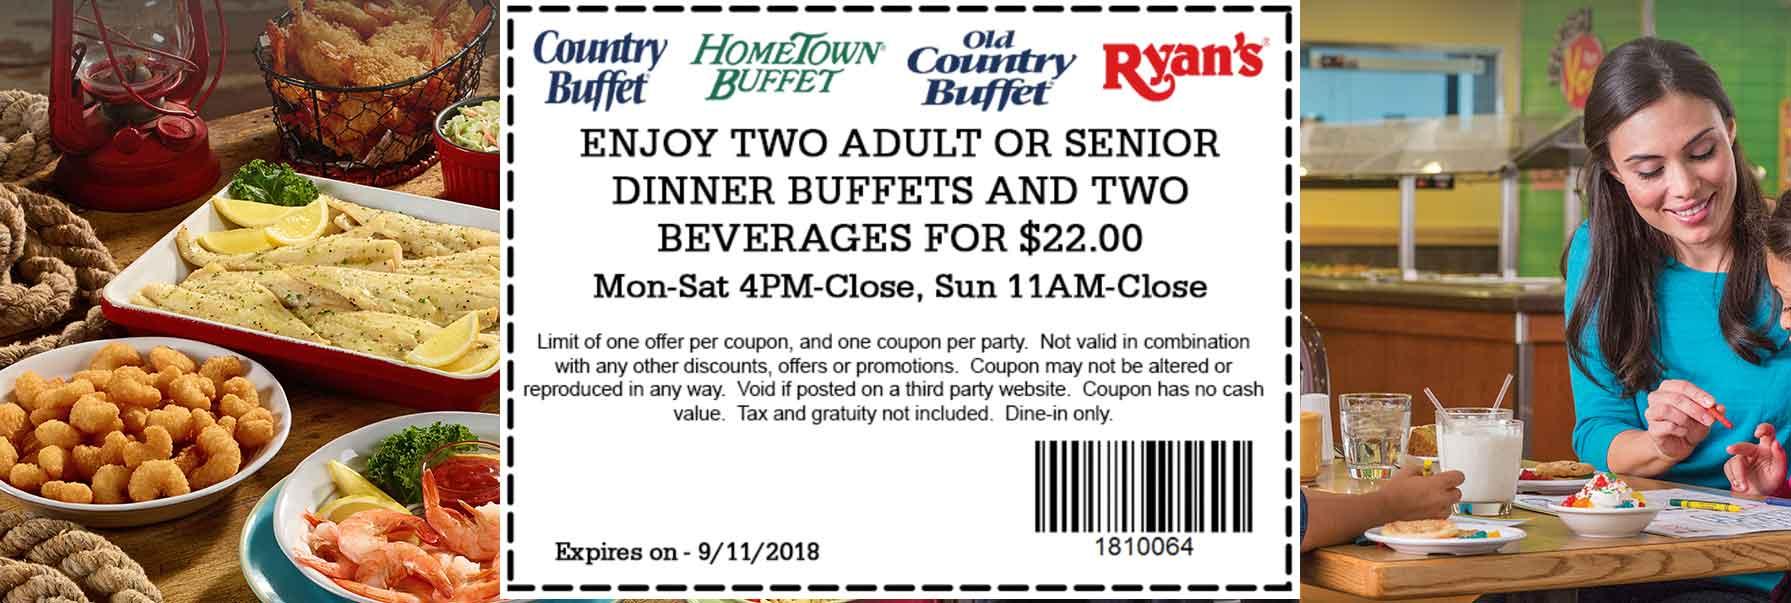 Hometown Buffet Coupon November 2019 2 dinners + drinks = $22 at Ryans, HomeTown Buffet & Old Country Buffet